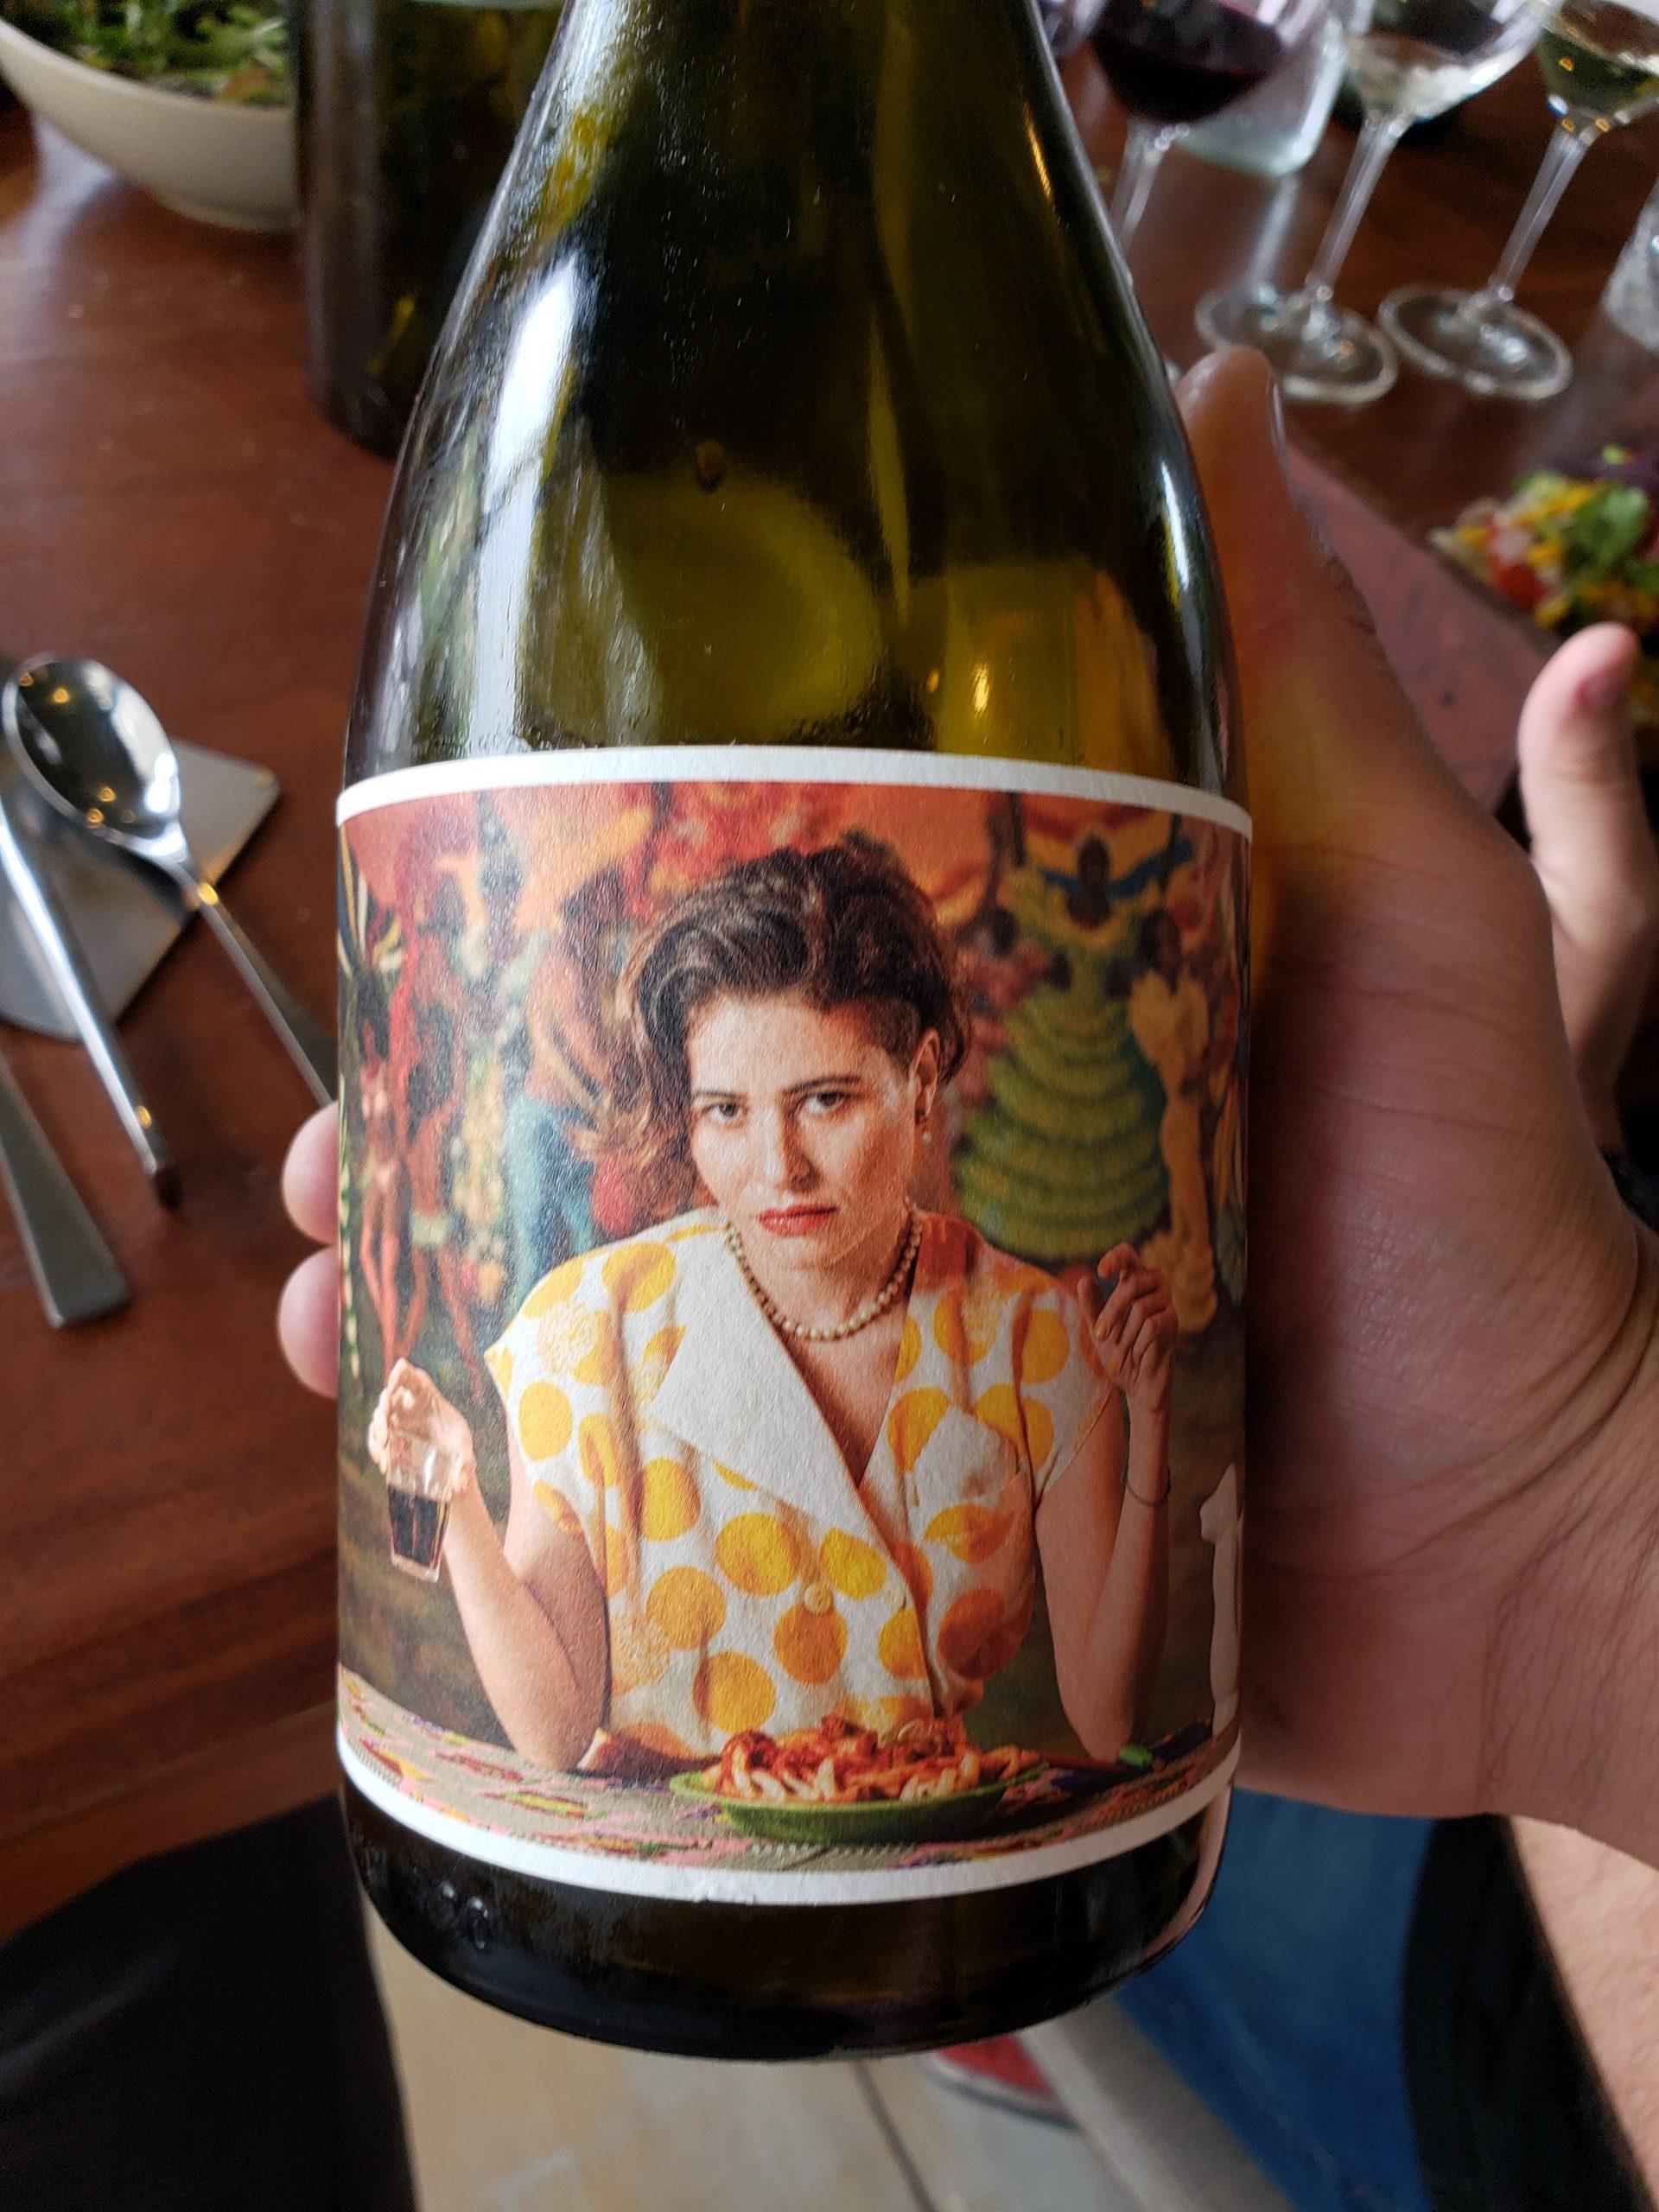 Riccitelli Bistró - Riccitelli Wines - Matías Riccitelli Tinto de la Casa